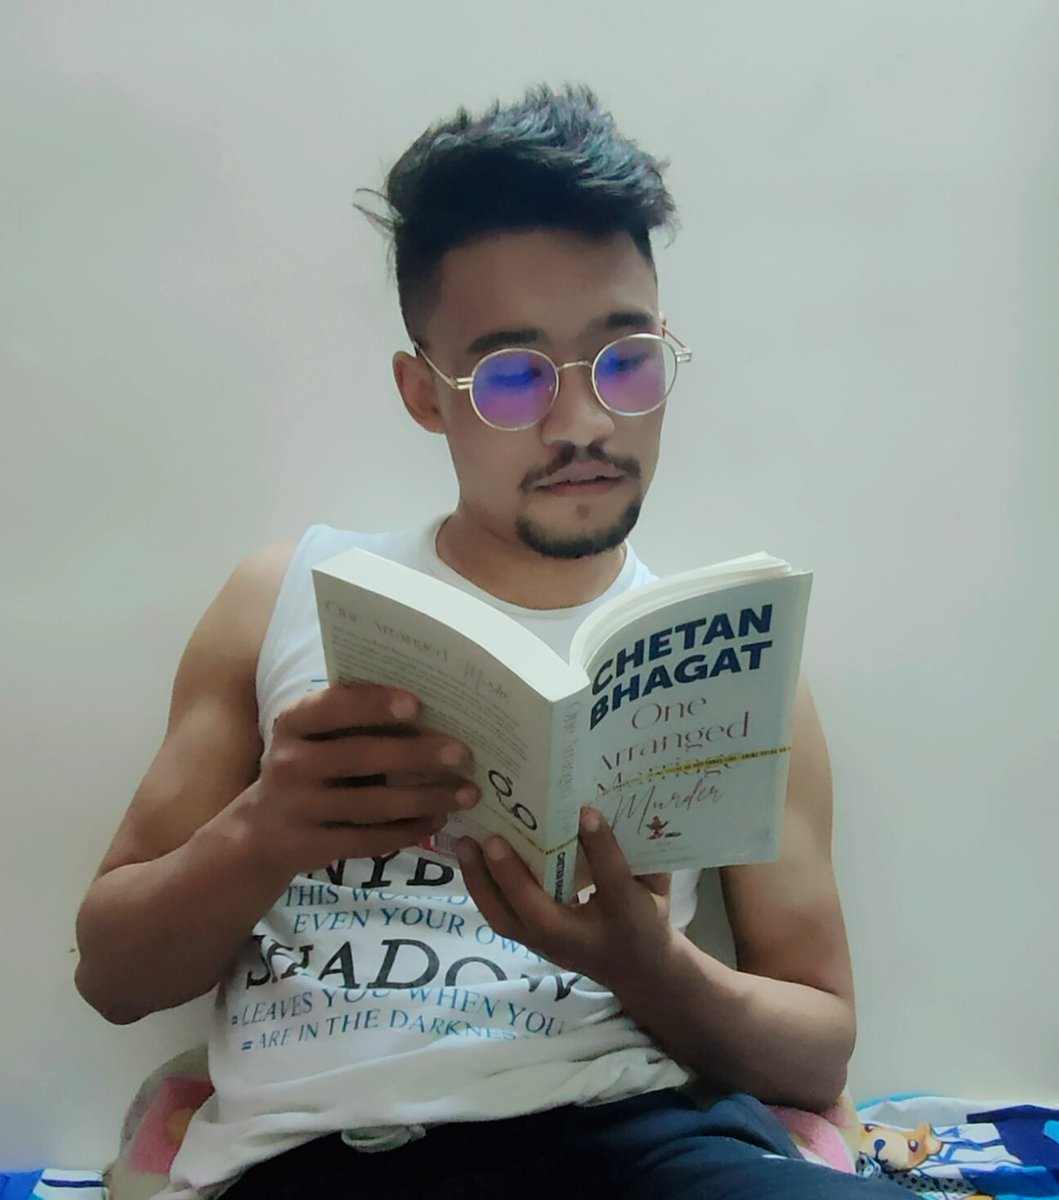 Defenestrate your loneliness through reading books. @chetan_bhagat  #OneArrangedMurder